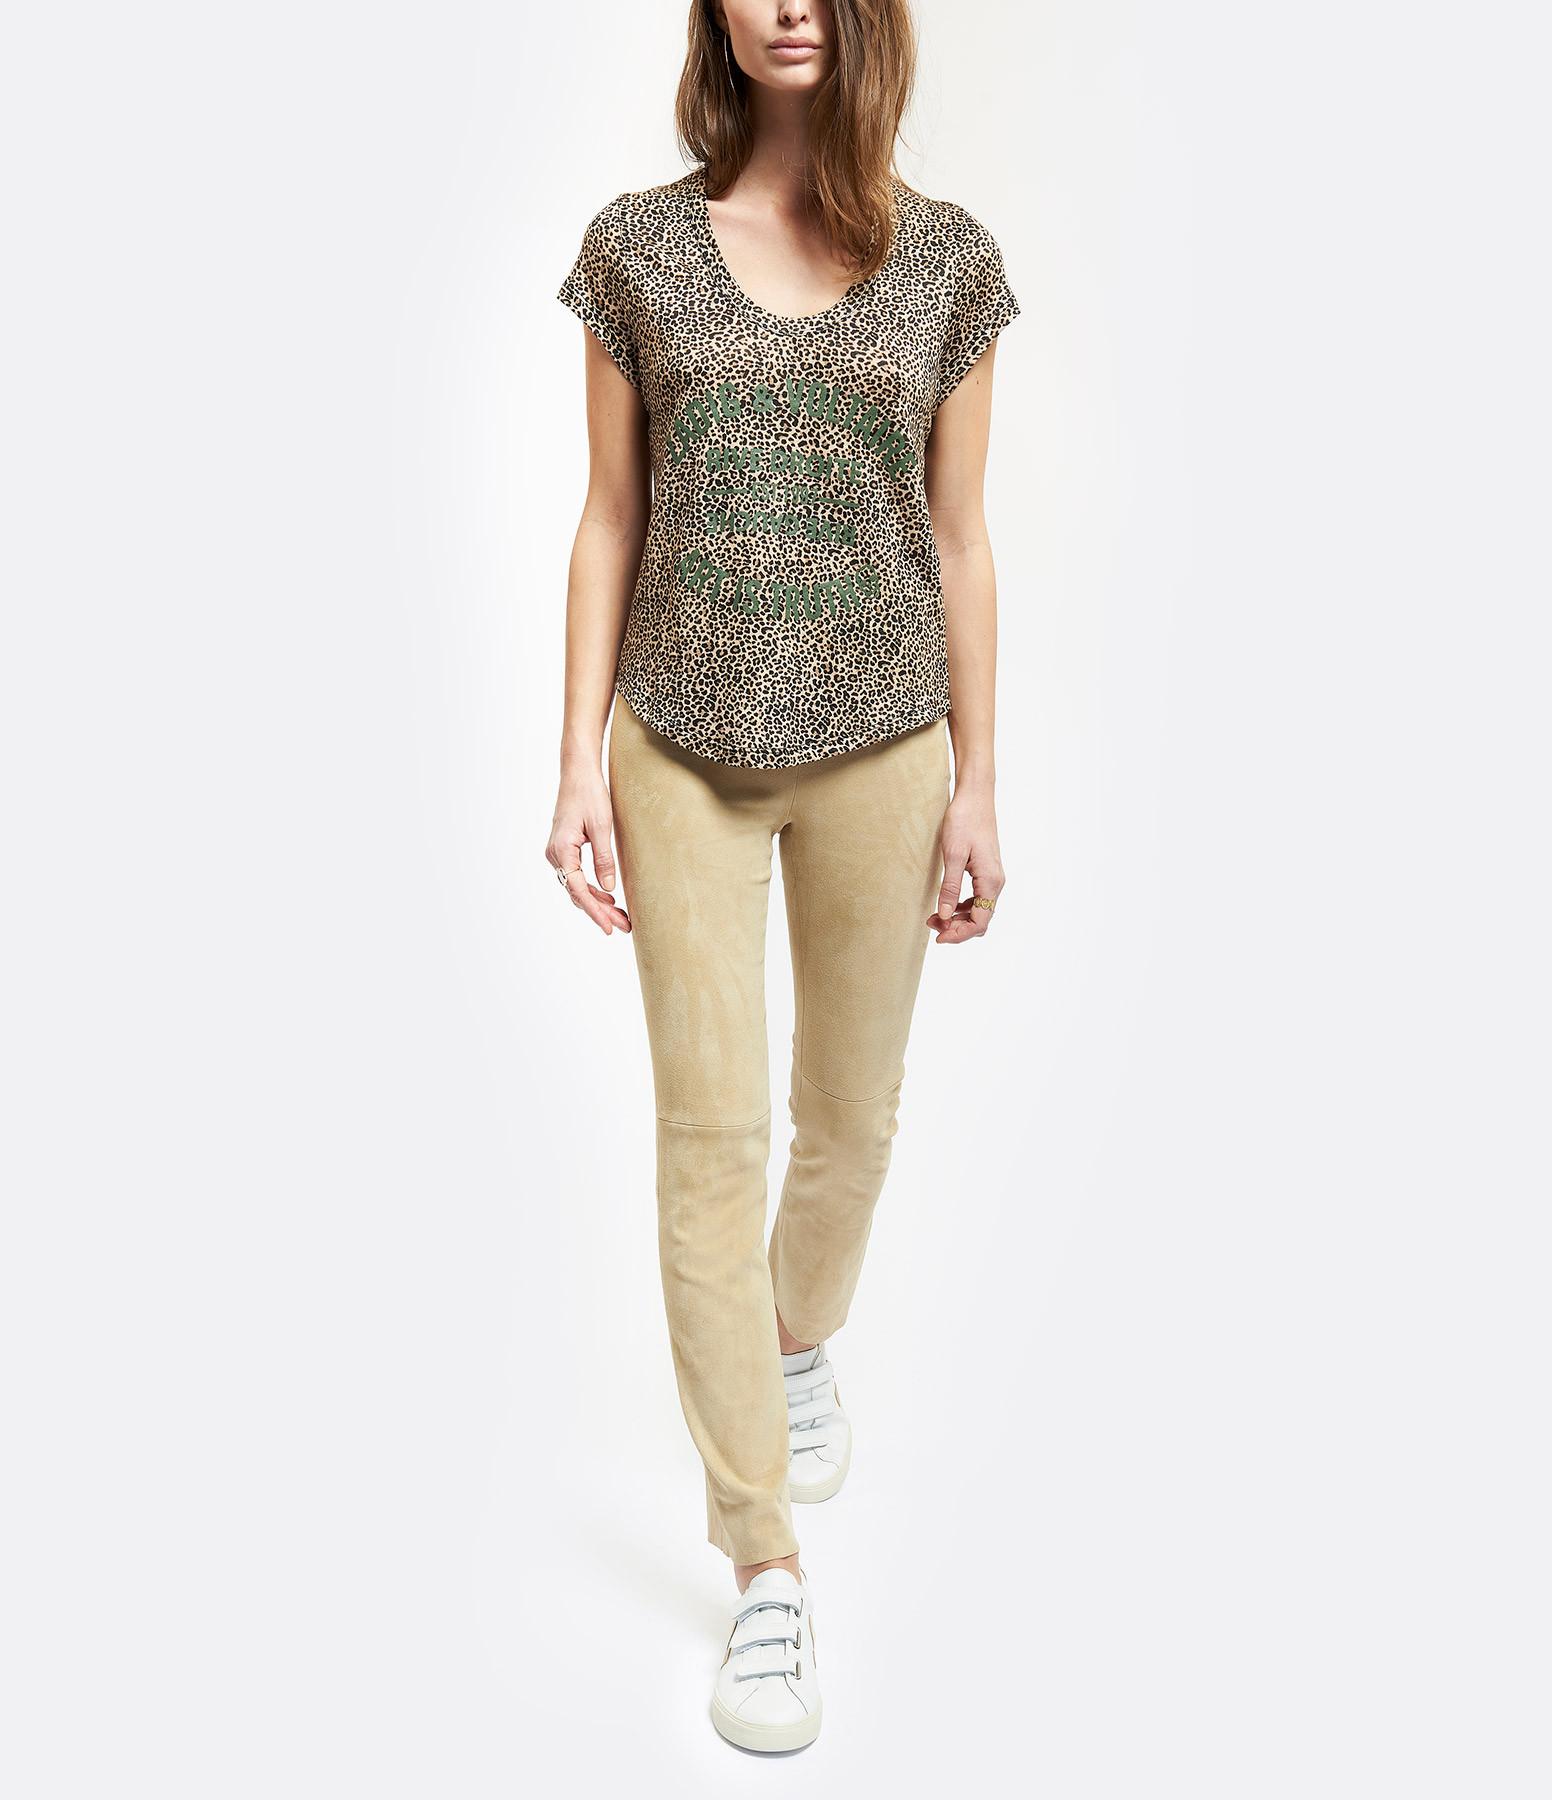 ZADIG & VOLTAIRE - Tee-shirt Aretha Lin imprimé Panthère Naturel